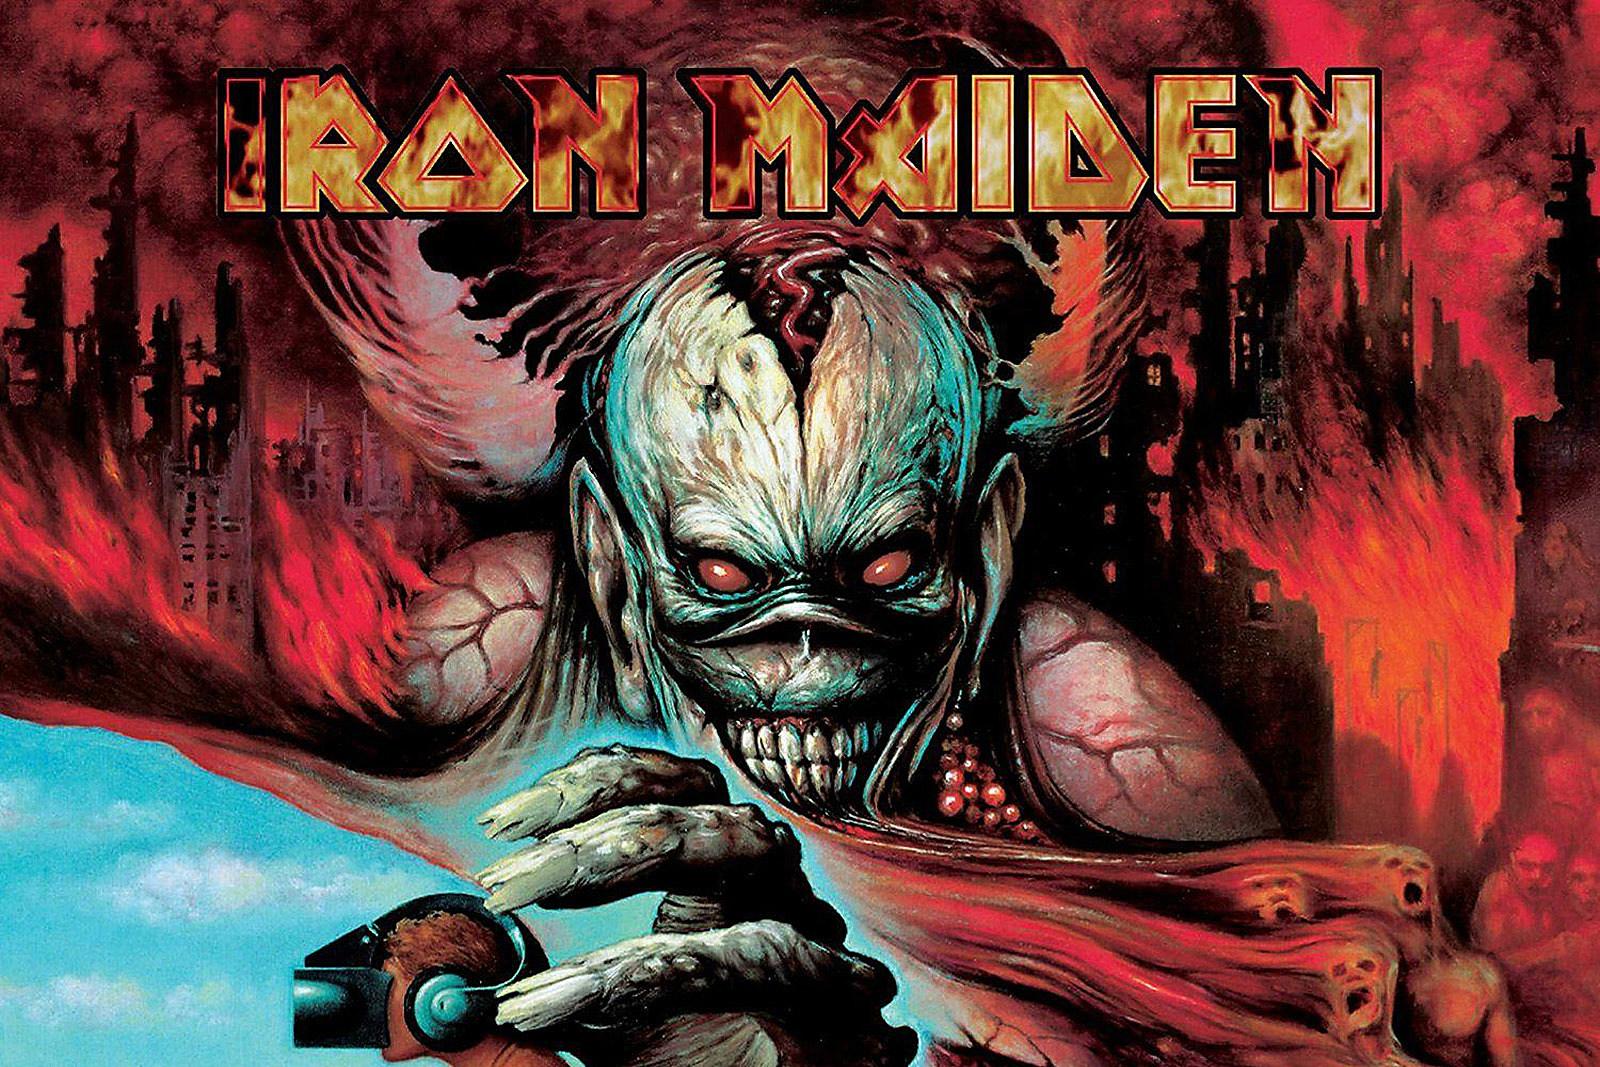 20 Years Ago: Iron Maiden's 'Virtual XI' Marks the End of the Blaze Bayley Era